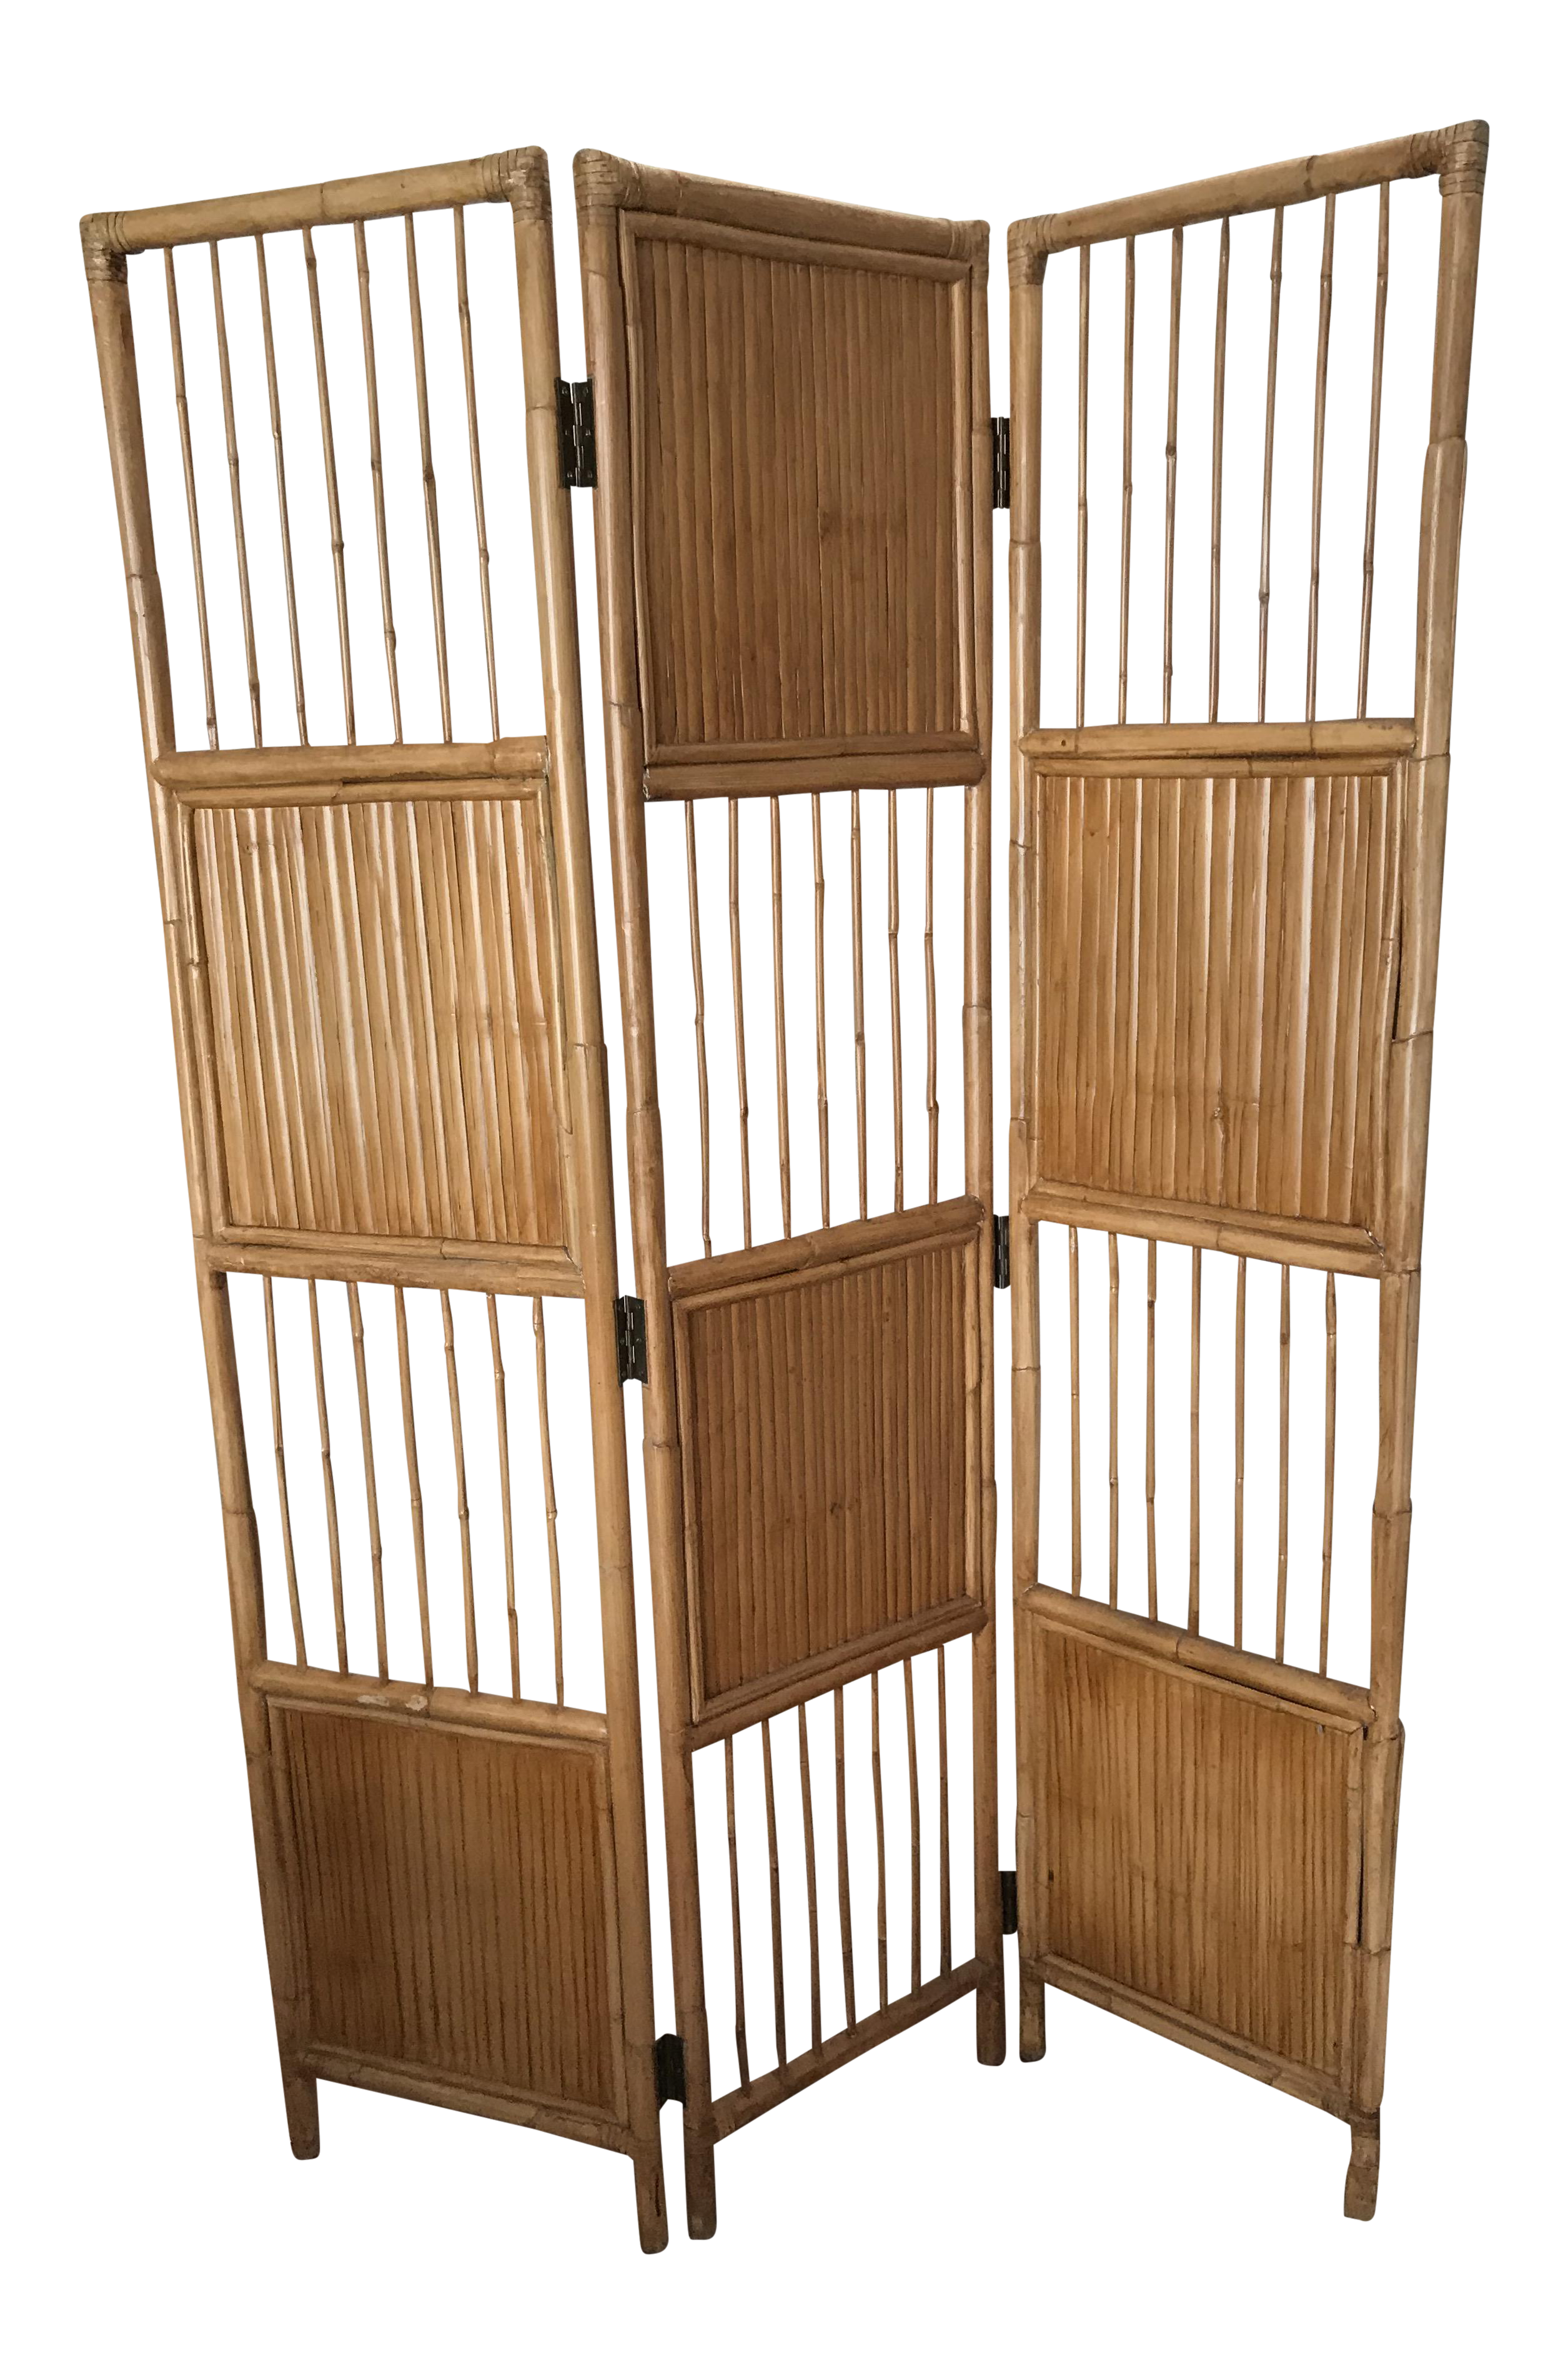 Vintage Pencil Bamboo Room Divider Screen Bamboo room divider